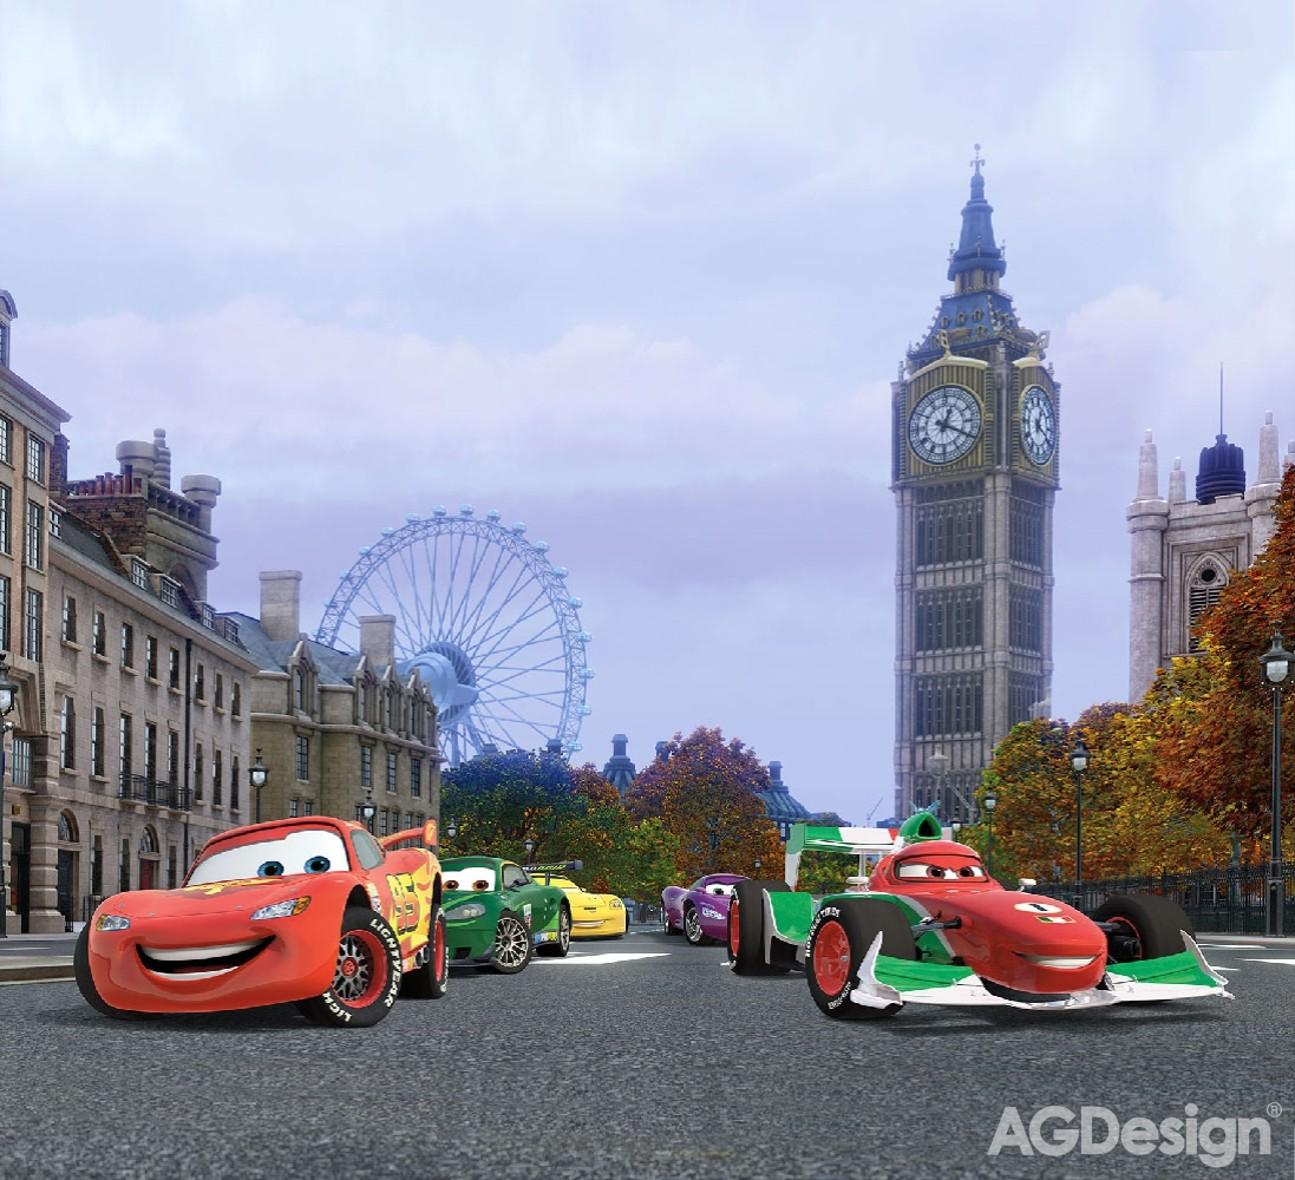 Fotozávěsy AG Design Cars FCP XXL 6000 (Závěs PES 280g | 280 x 245 cm)